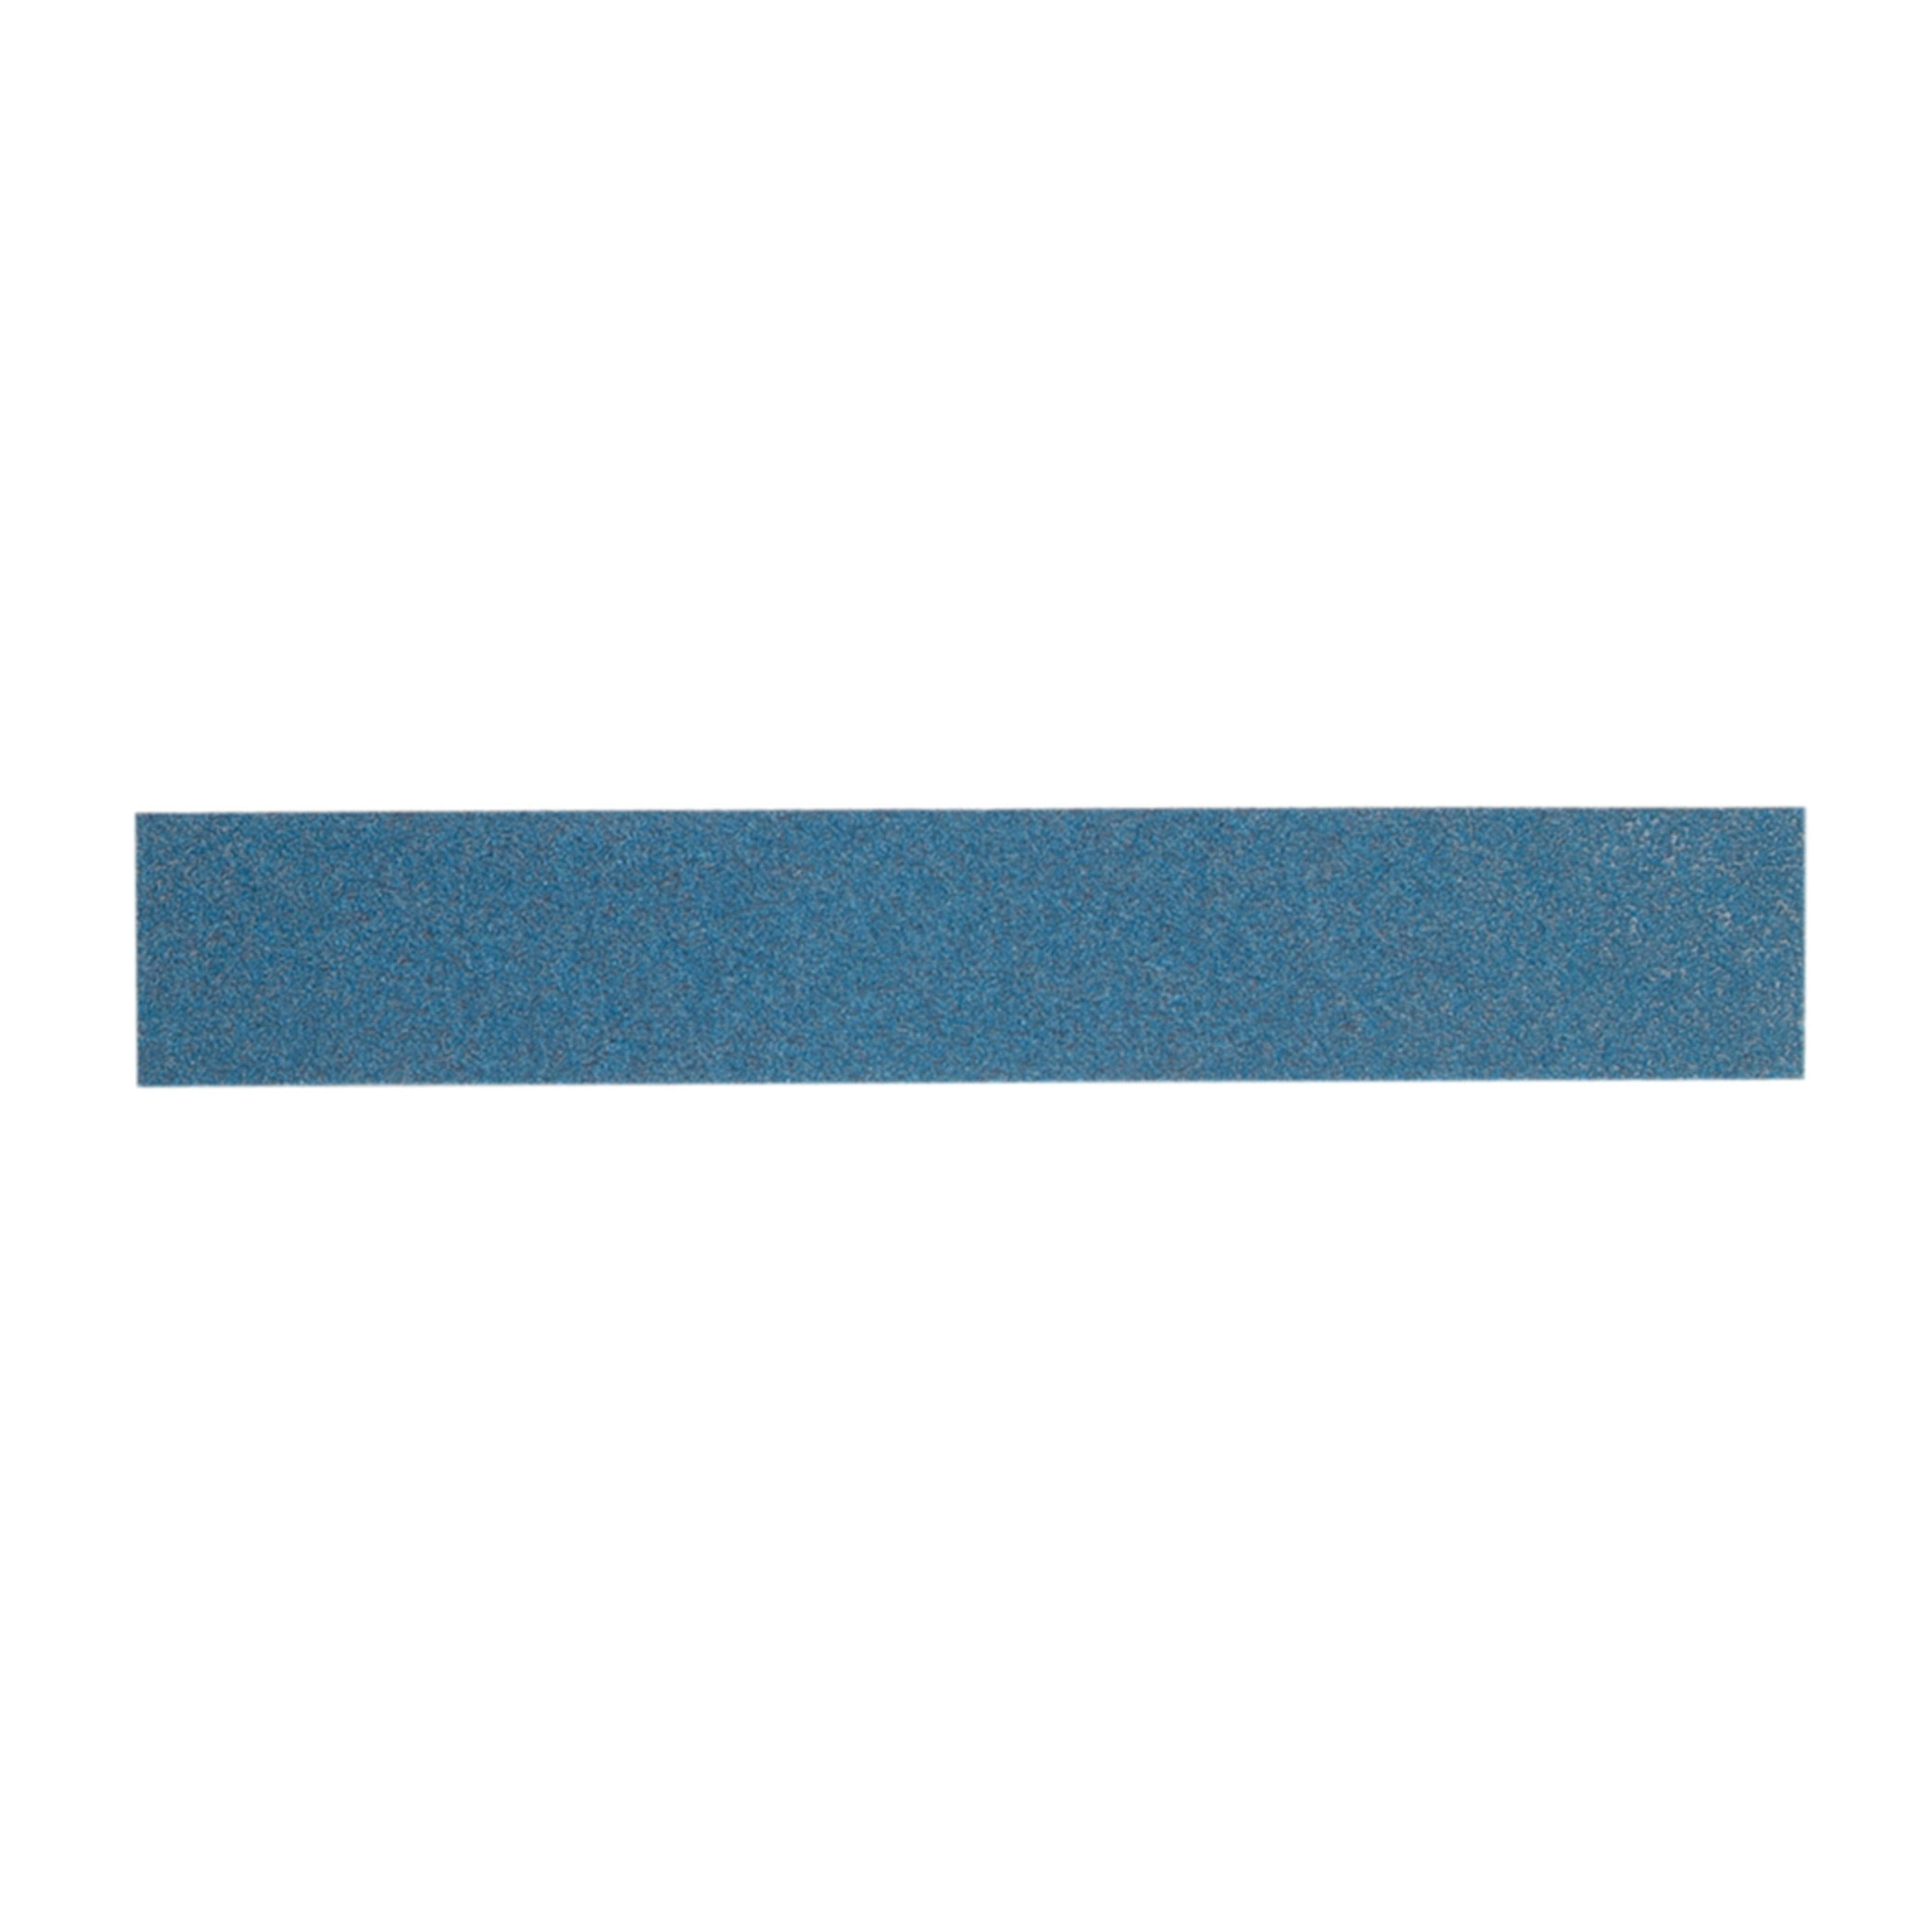 Norton® BlueFire® 66261123622 H875P Clip-On Non-PSA Coated File Strip, 17-1/2 in L x 2-3/4 in W, 36 Grit, Extra Coarse Grade, Zirconia Alumina Abrasive, Paper Backing